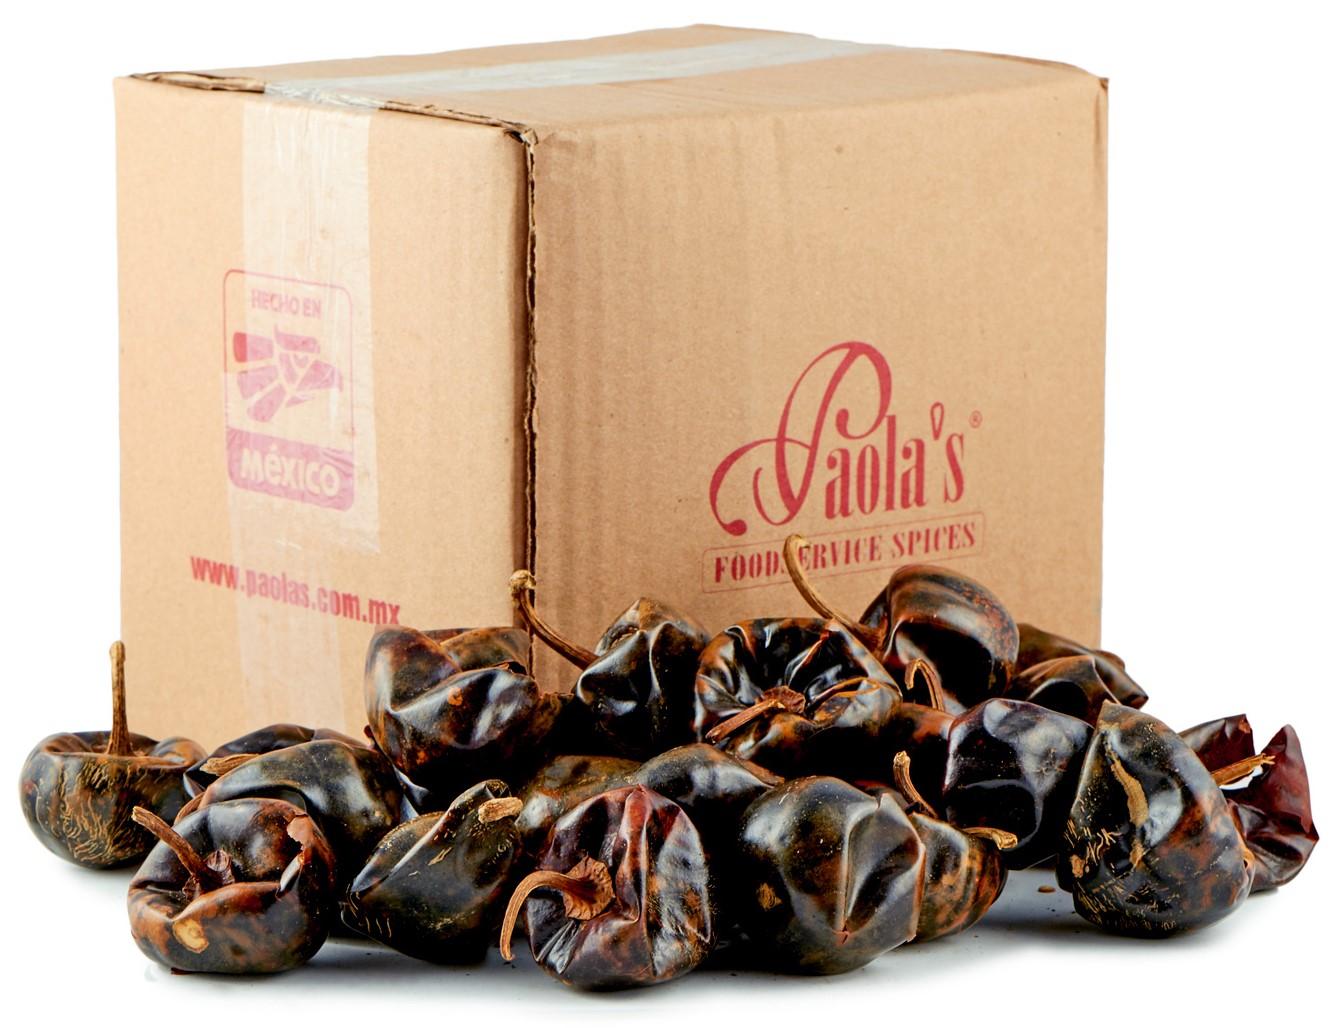 Chili Cascabel getrocknet Paolas 500 g